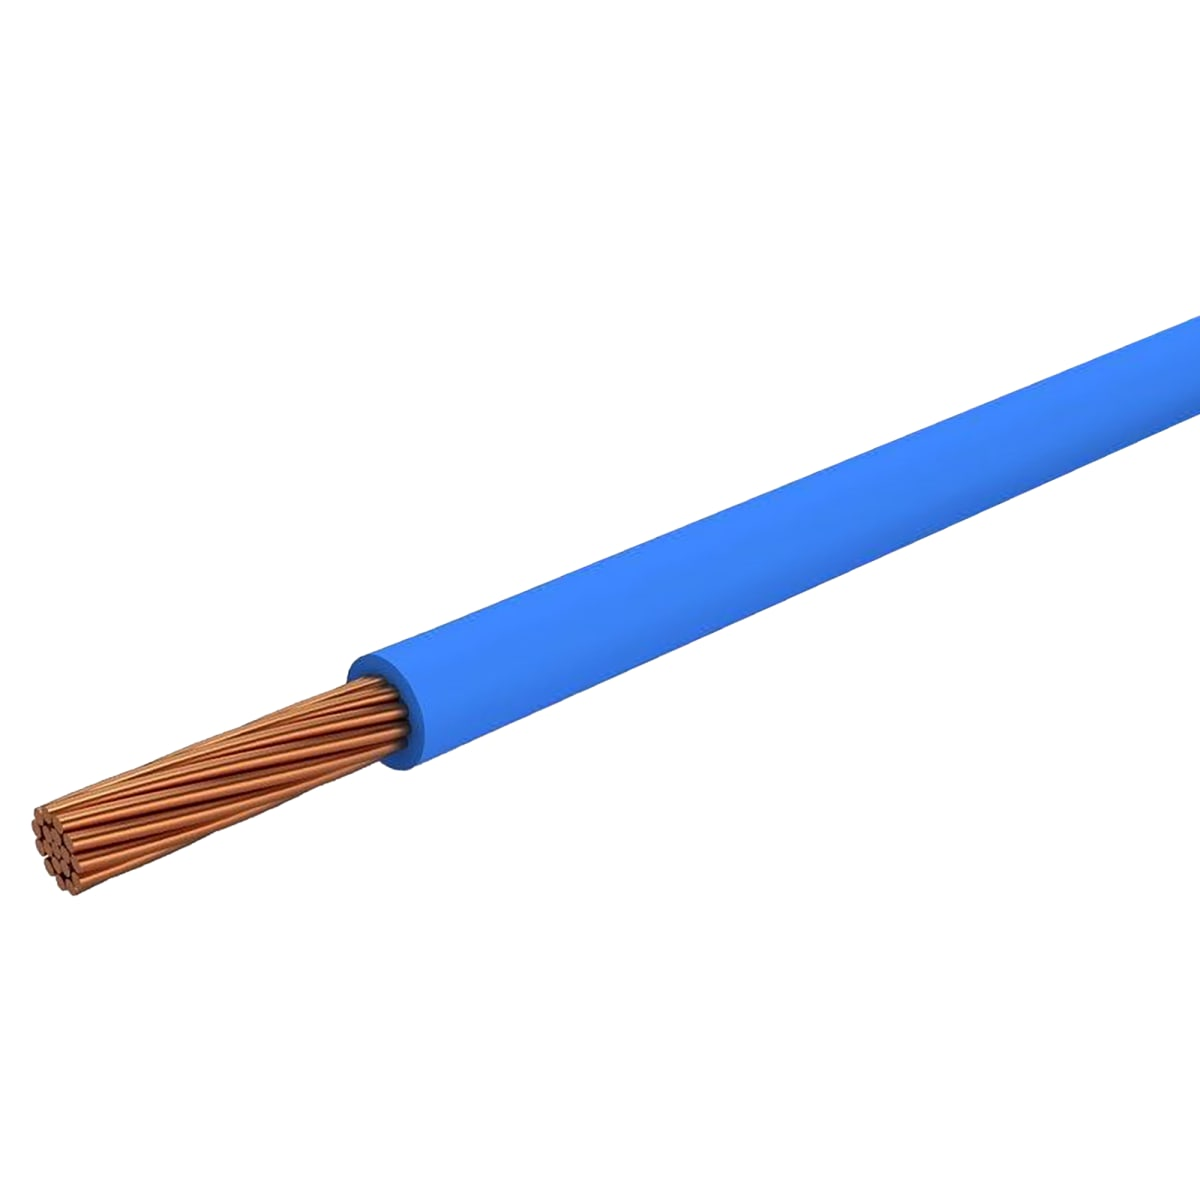 Провод Ореол ПуГВ 1x2.5, на отрез, цвет синий